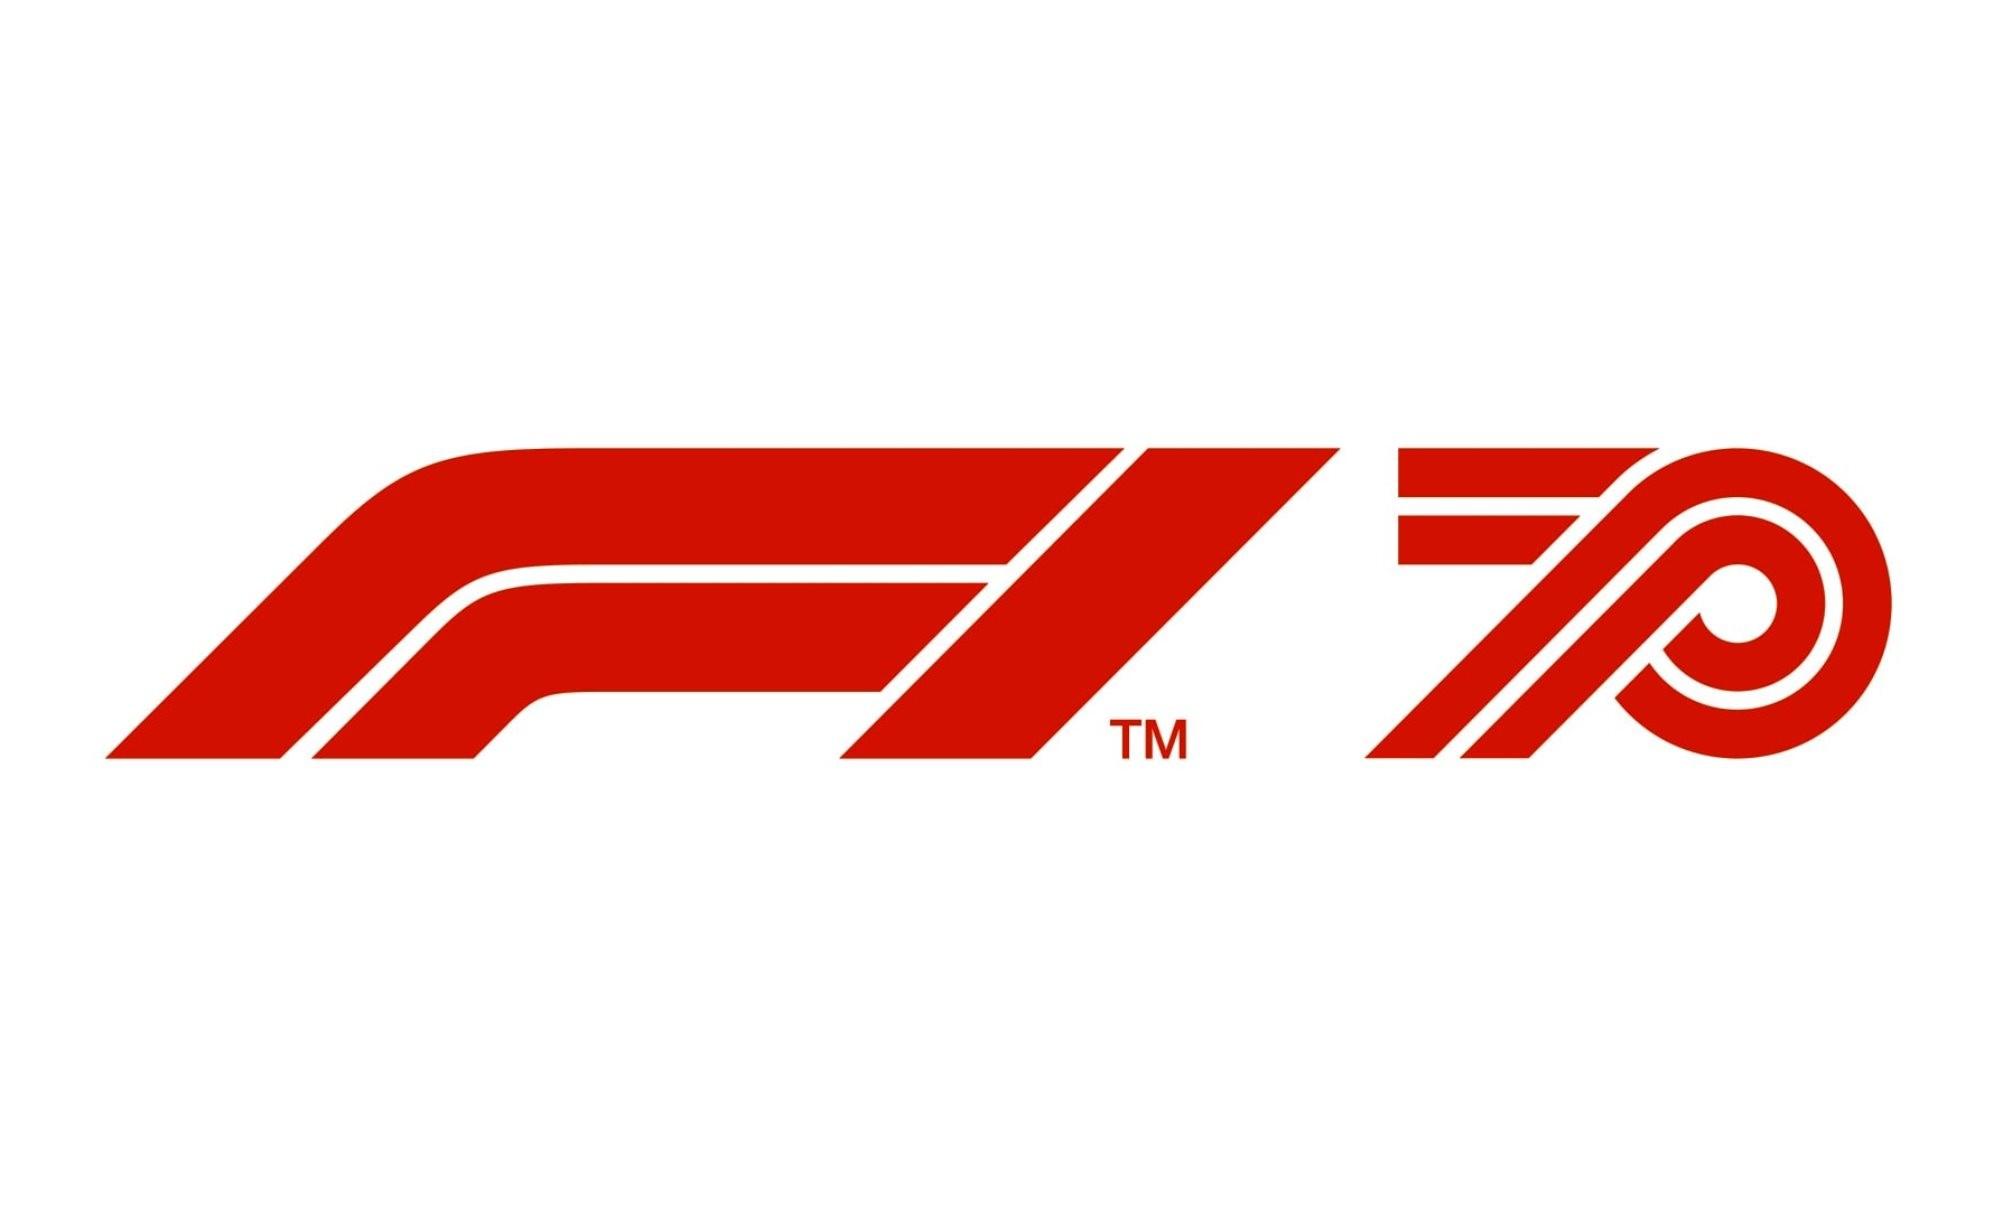 2020 F1 Season Start Postponed